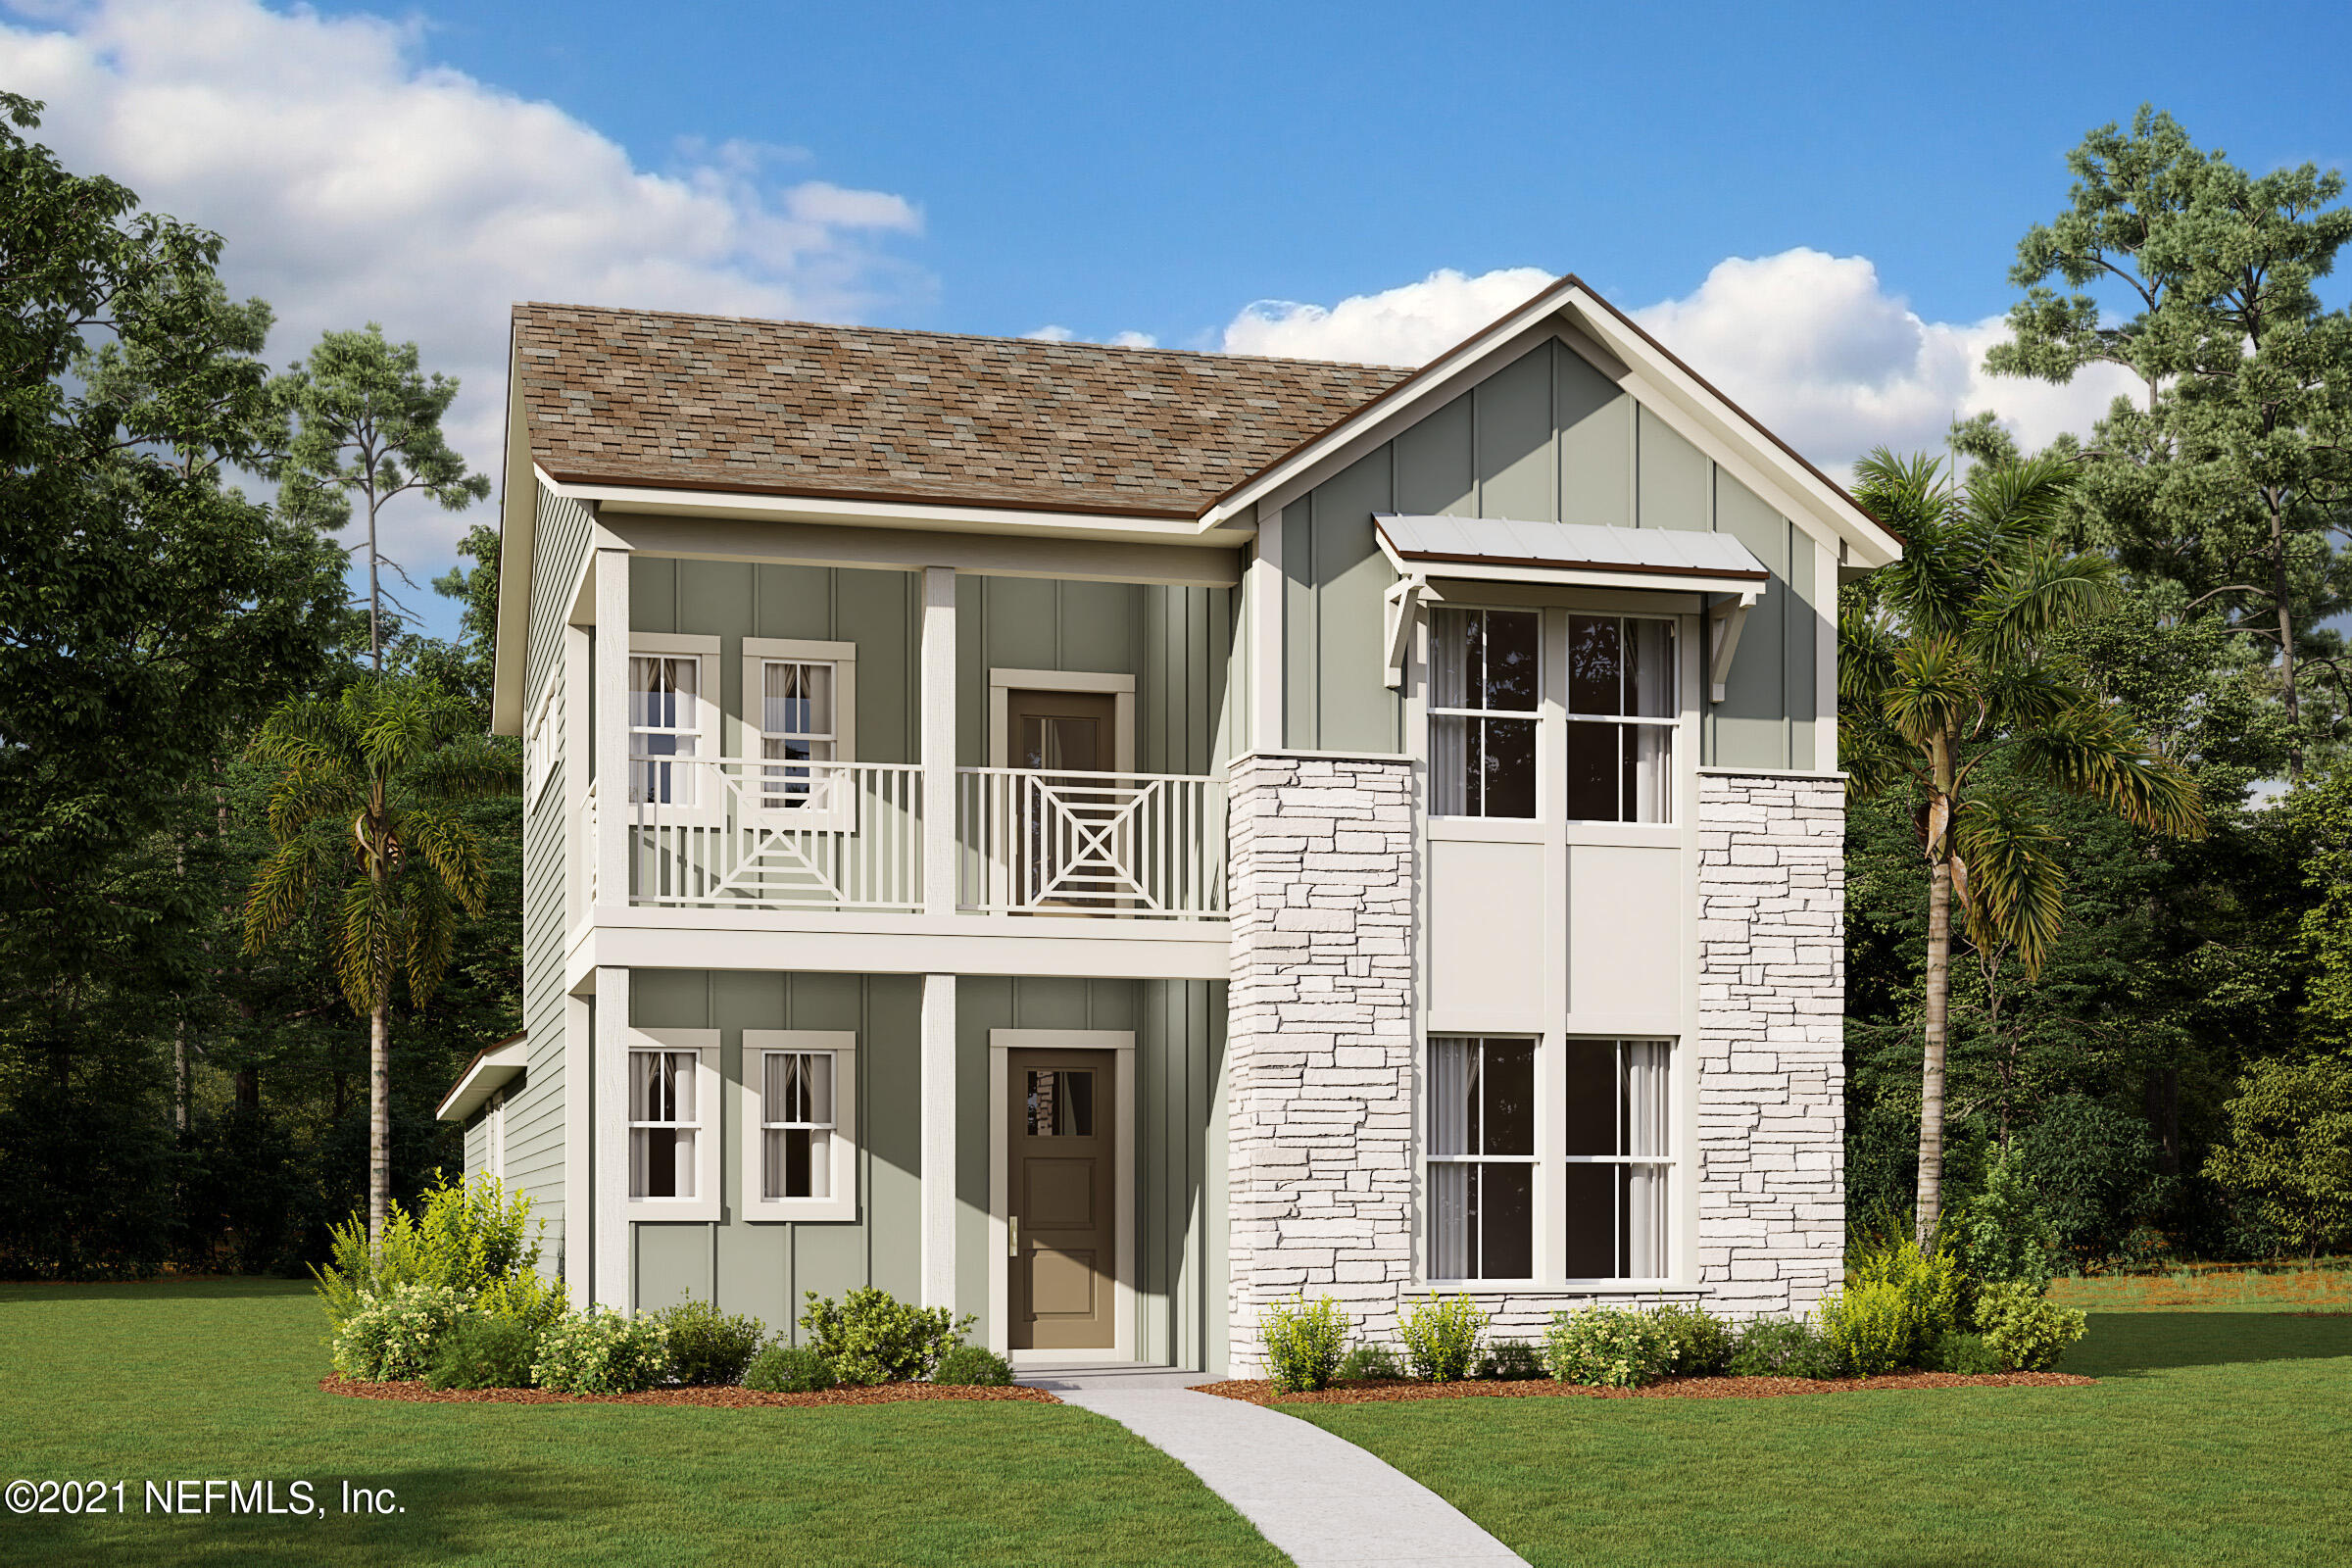 85 PARK CENTER, PONTE VEDRA, FLORIDA 32081, 4 Bedrooms Bedrooms, ,3 BathroomsBathrooms,Residential,For sale,PARK CENTER,1132904